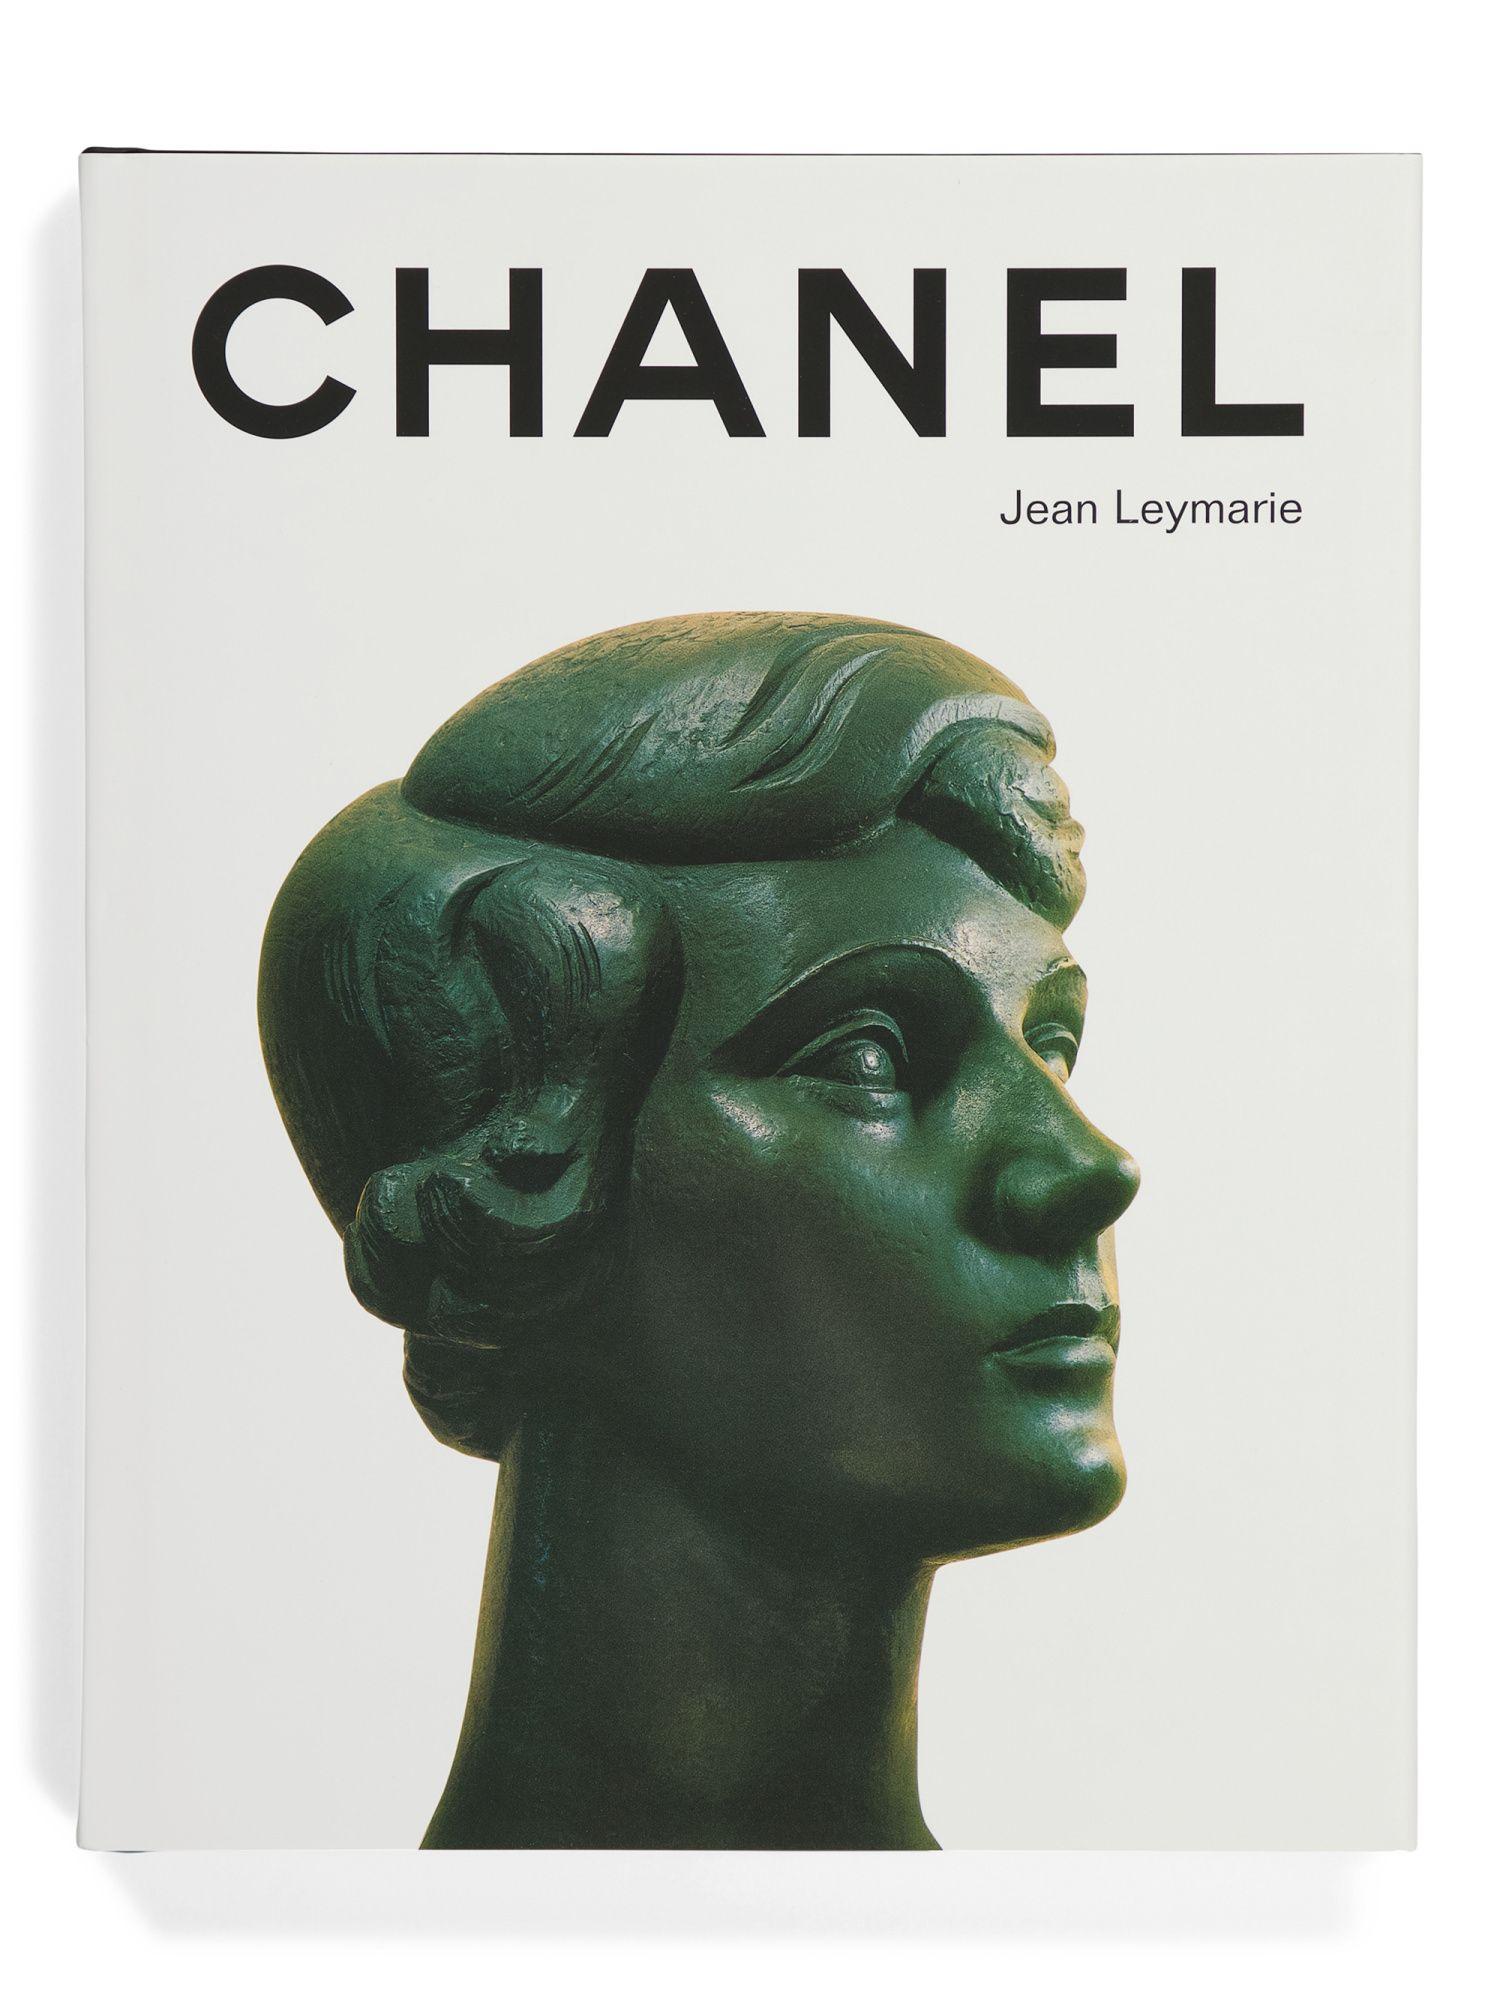 Chanel In 2021 Chanel Book Chanel Tj Maxx